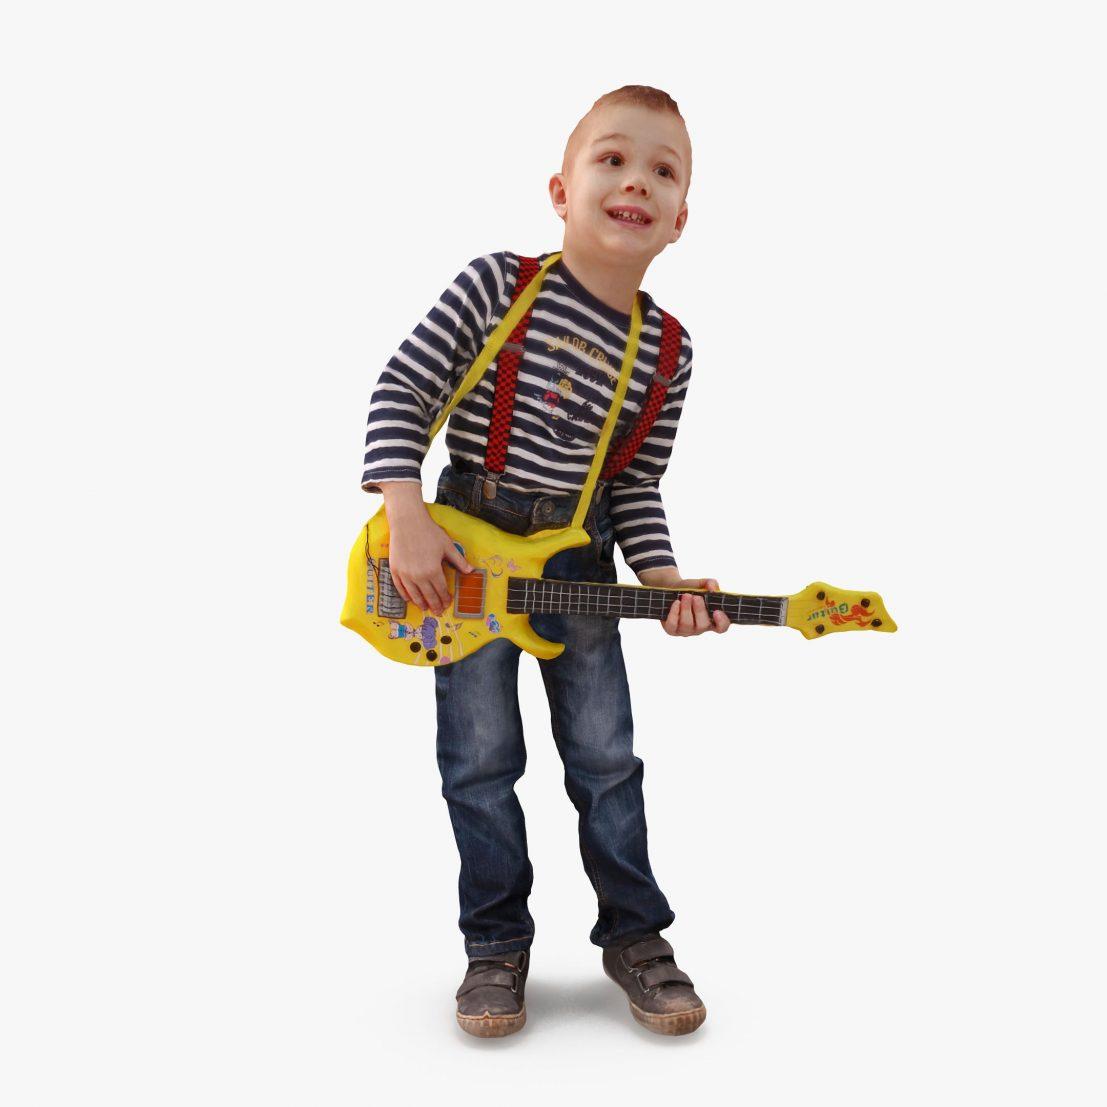 Guitar Boy 3D Model | 3DTree Scanning Studio